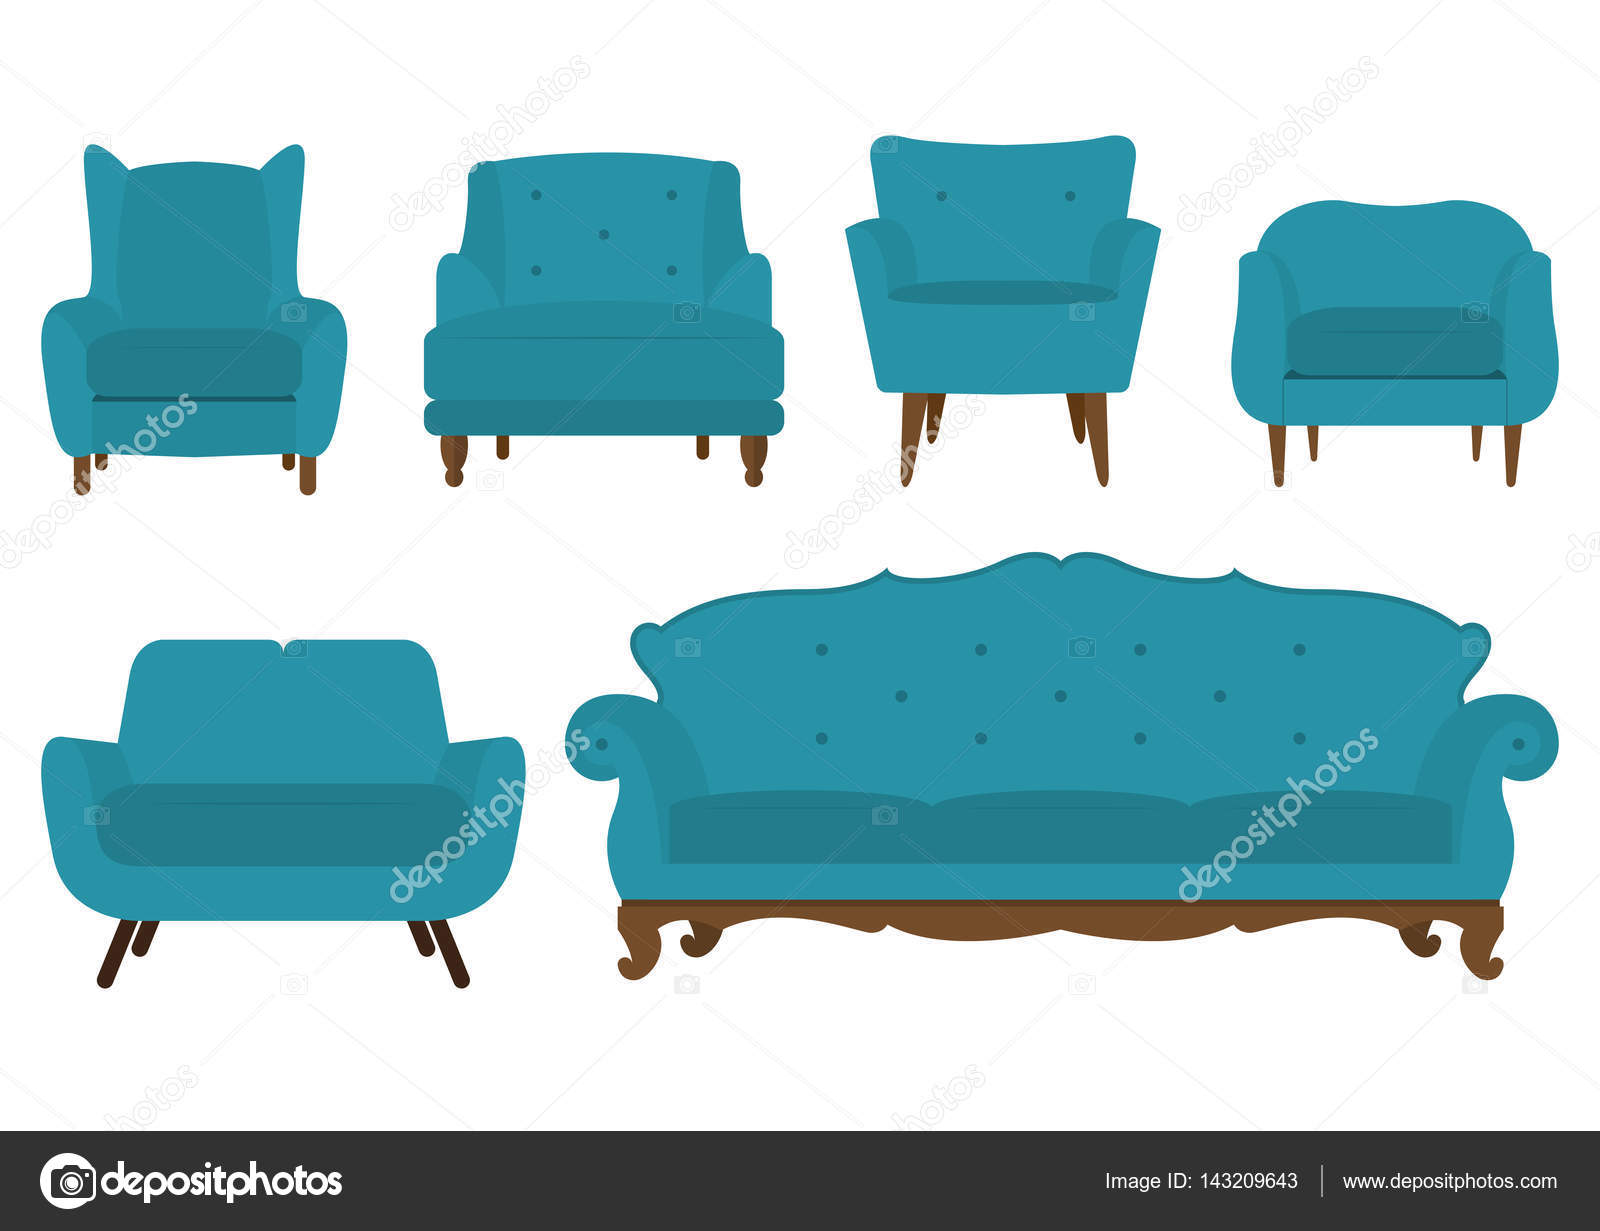 Astounding Satz Von Stuhl Sofa Und Sessel Im Flat Design Alphanode Cool Chair Designs And Ideas Alphanodeonline